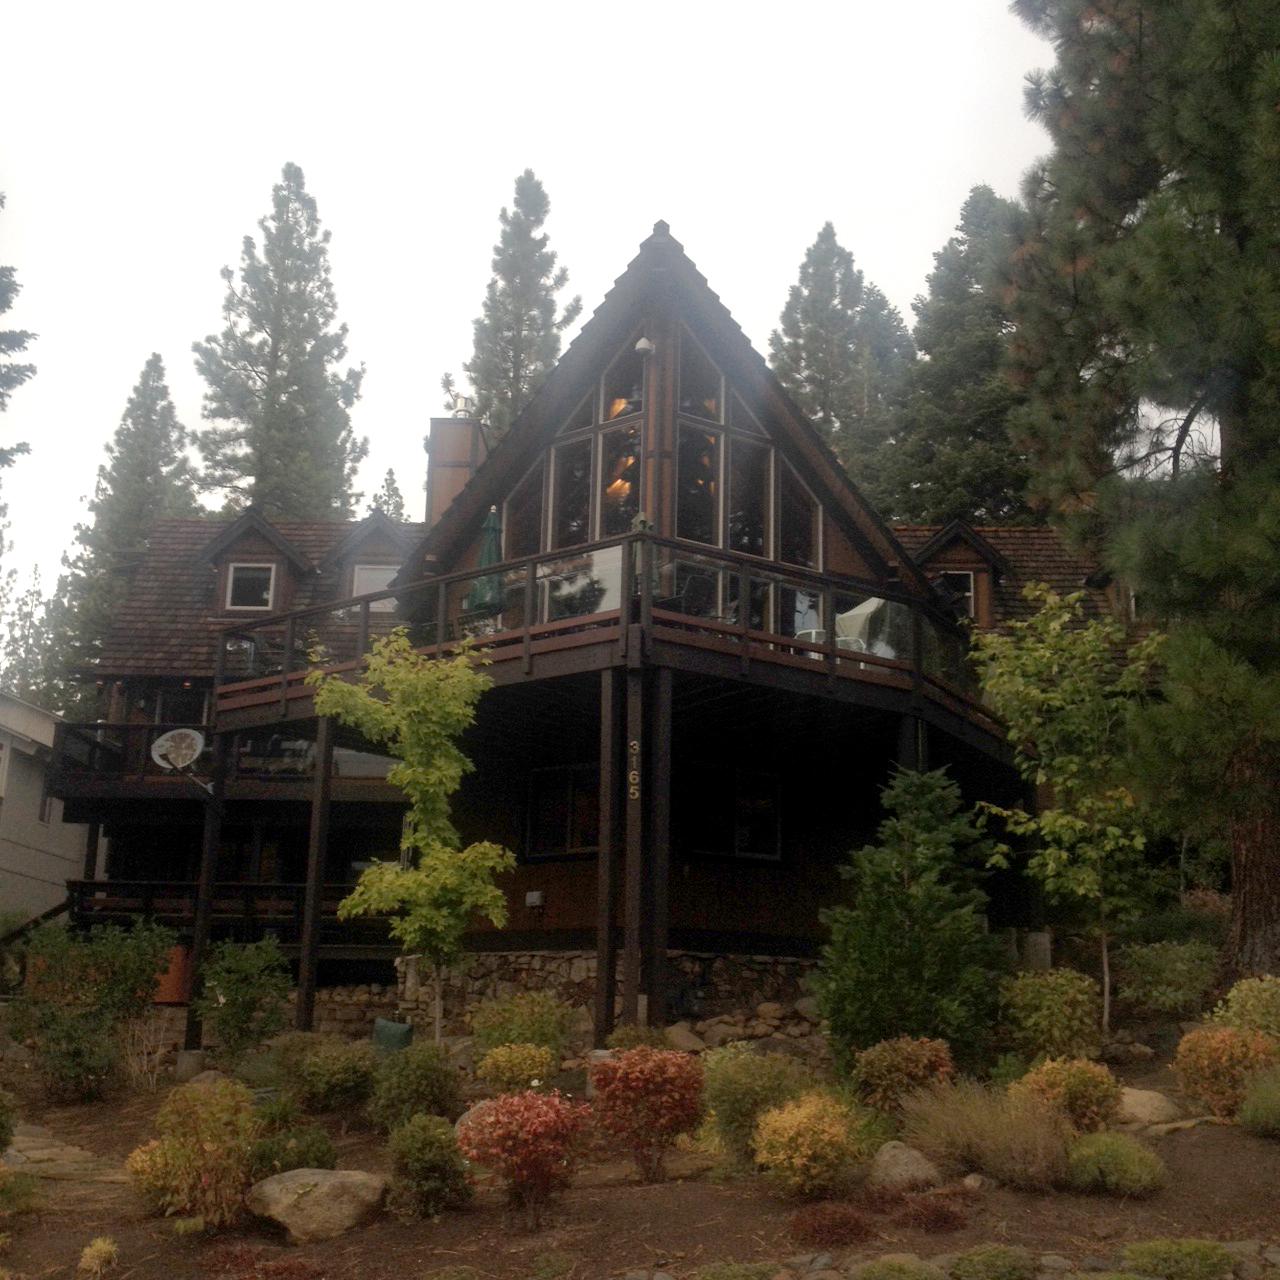 Quite a dreamy cabin, huh?